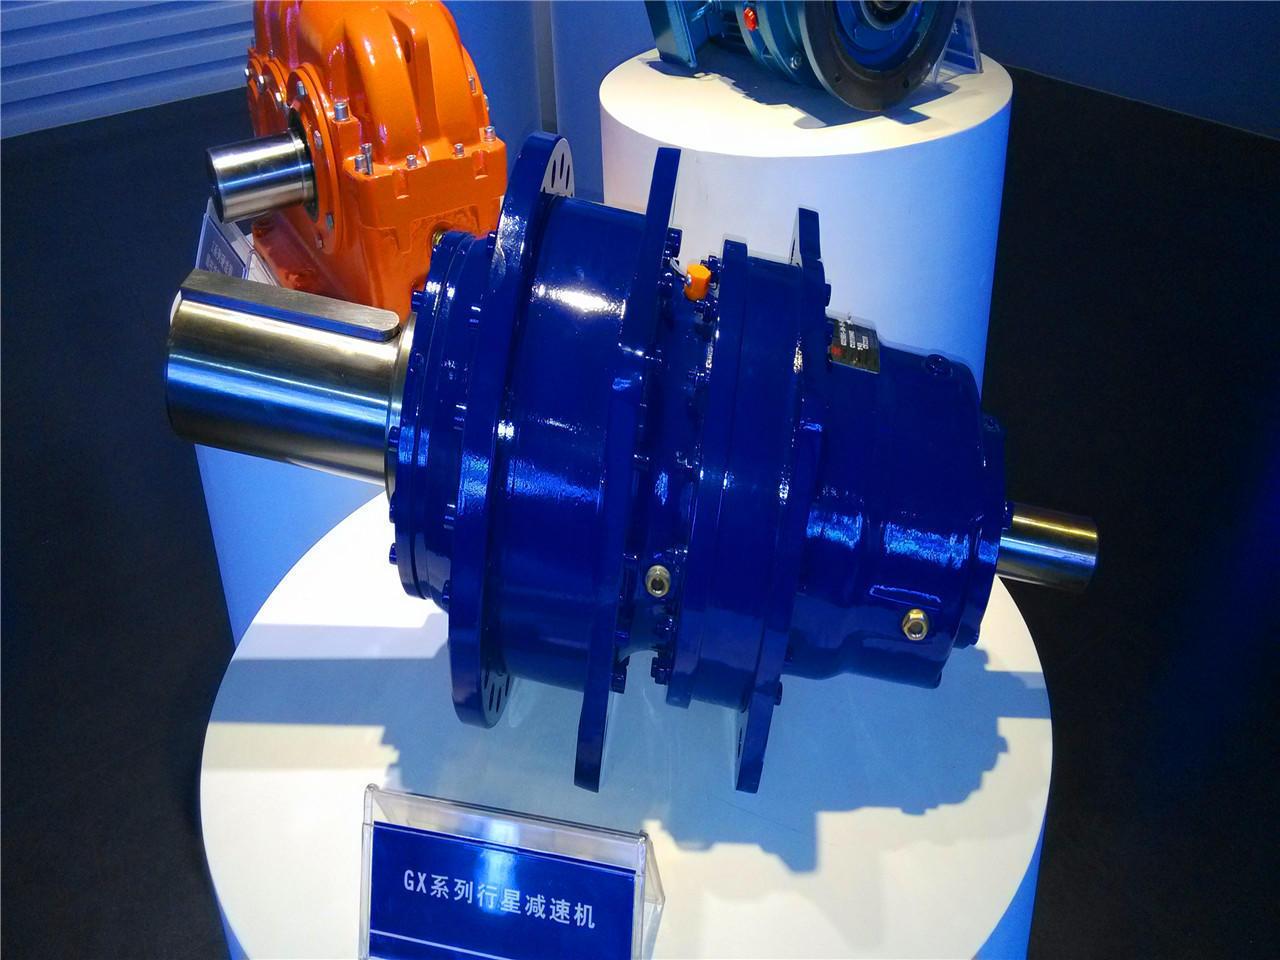 Wind turbine gearbox